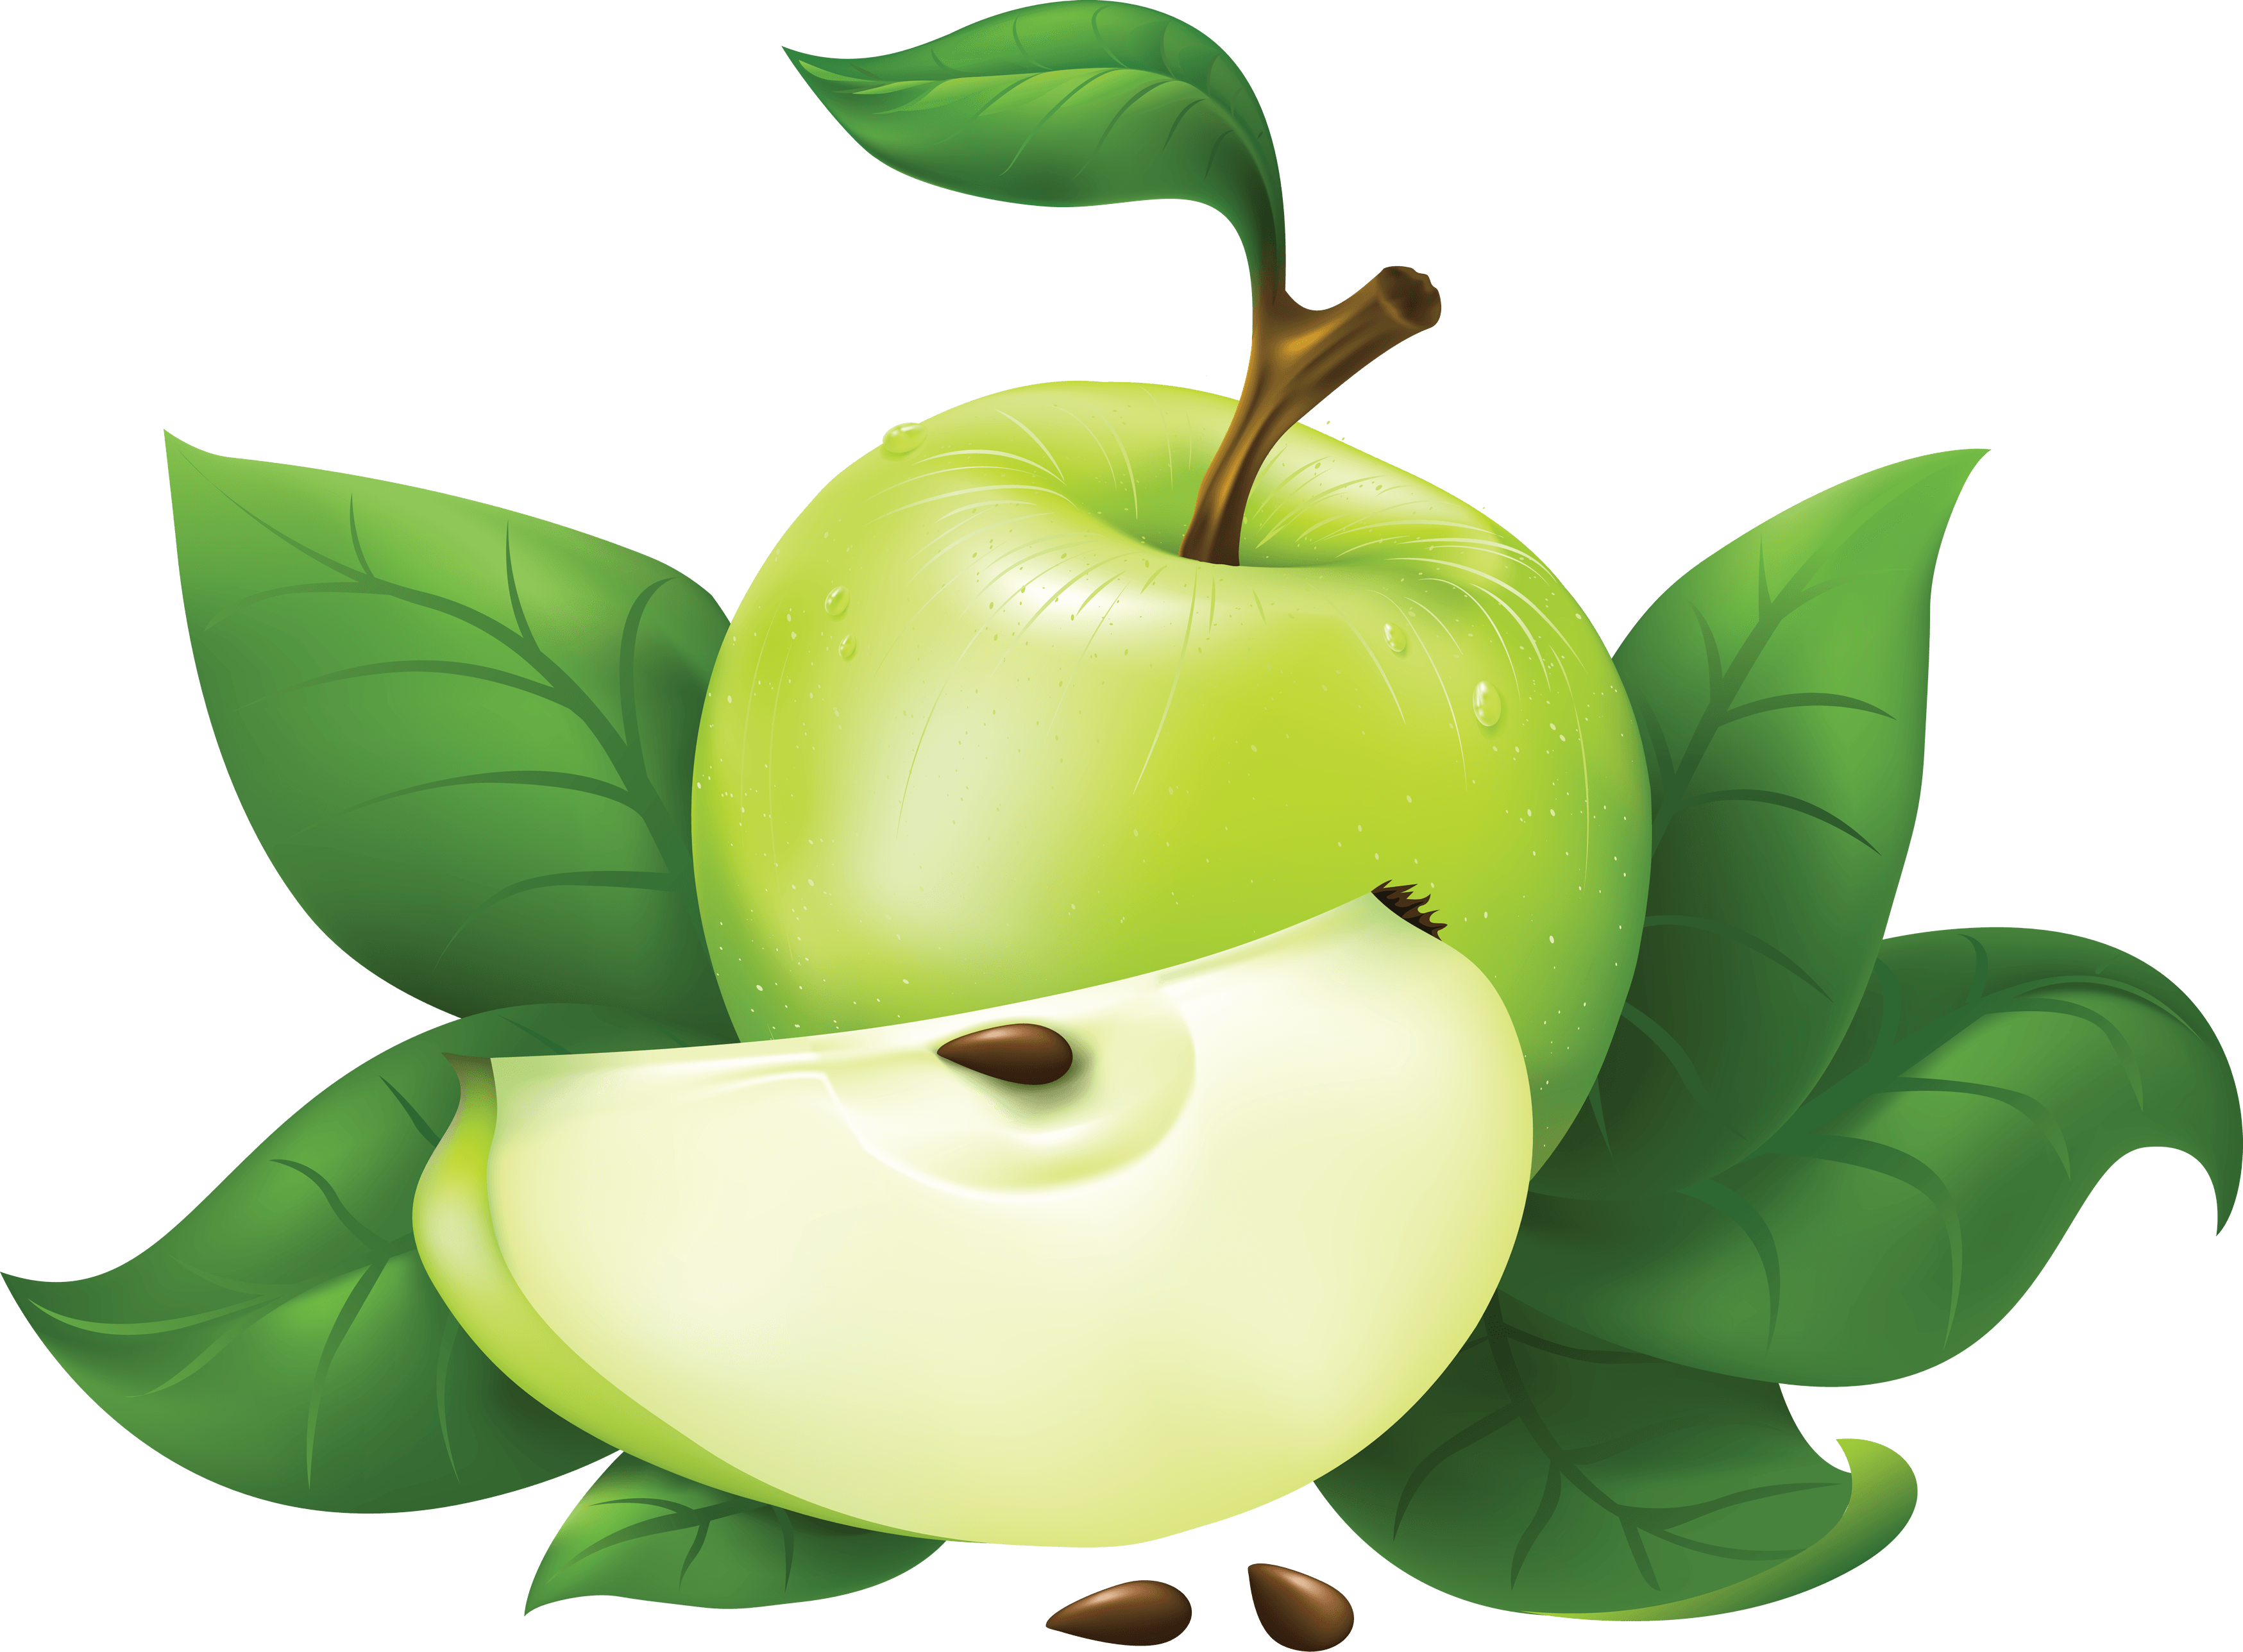 Download Free Green Apple Png Image ICON favicon   FreePNGImg